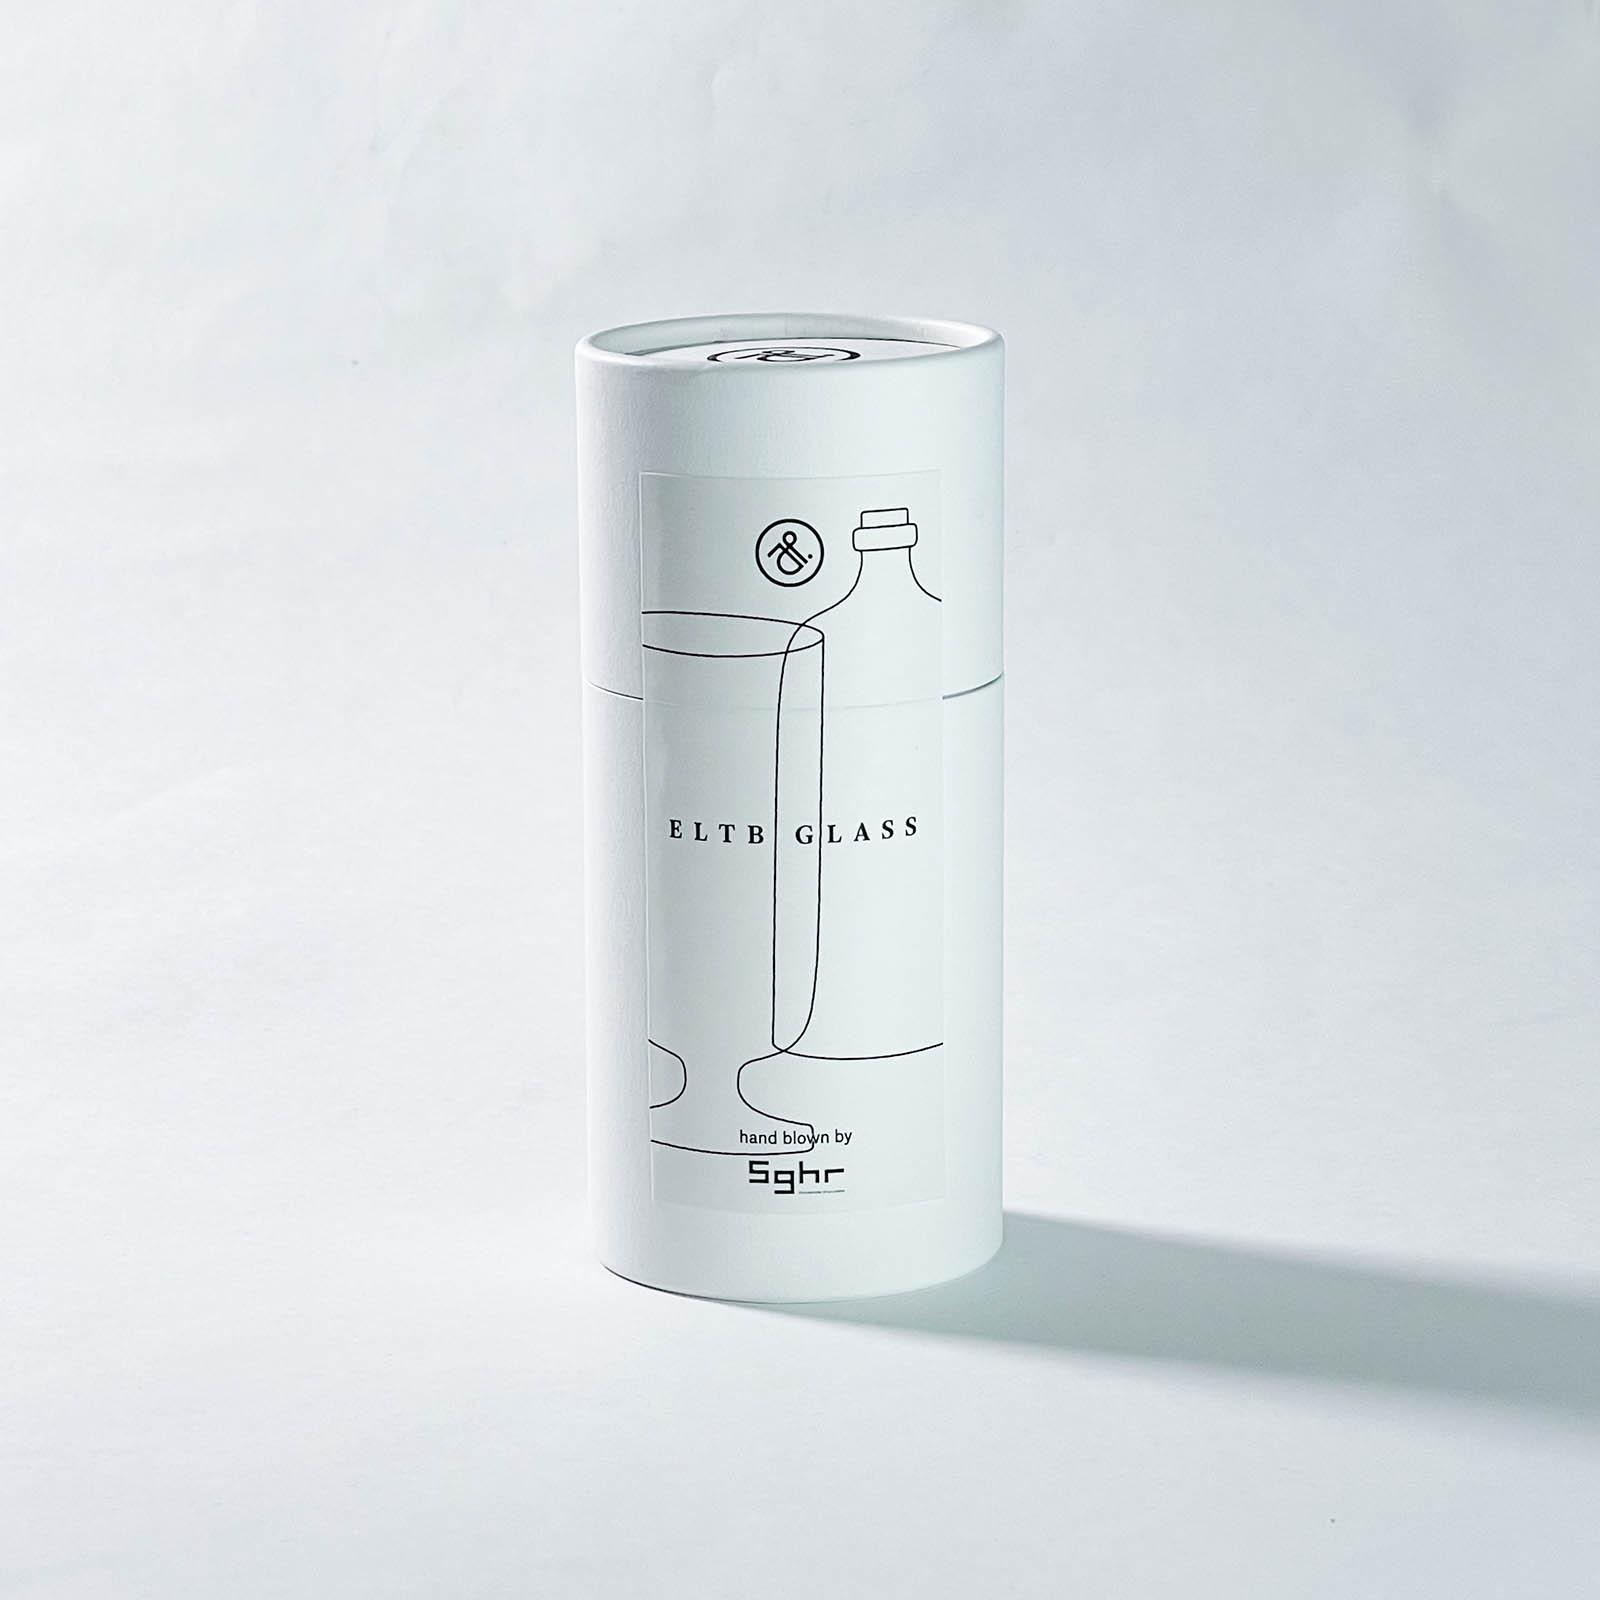 mitosaya × Sghr:蒸留酒 G&R KICKS 1本+ELTB GLASS 1客 セット GIFT